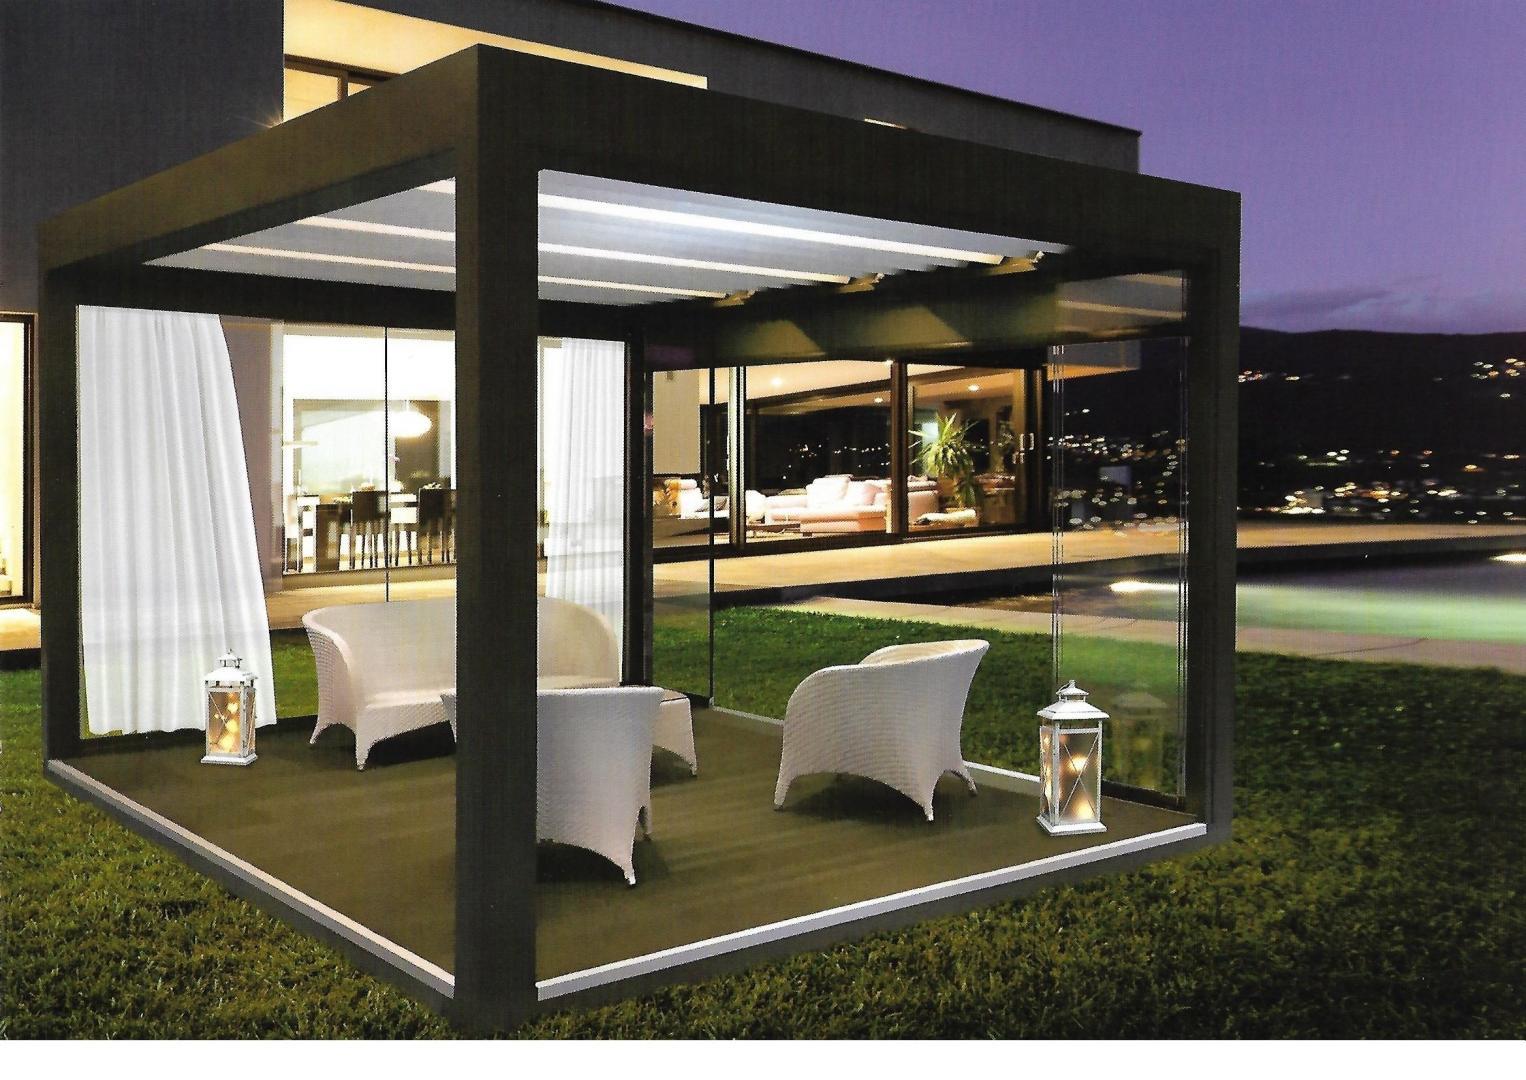 Veranda styl 39 installateur pergola bioclimatique for Pergola bioclimatique retractable